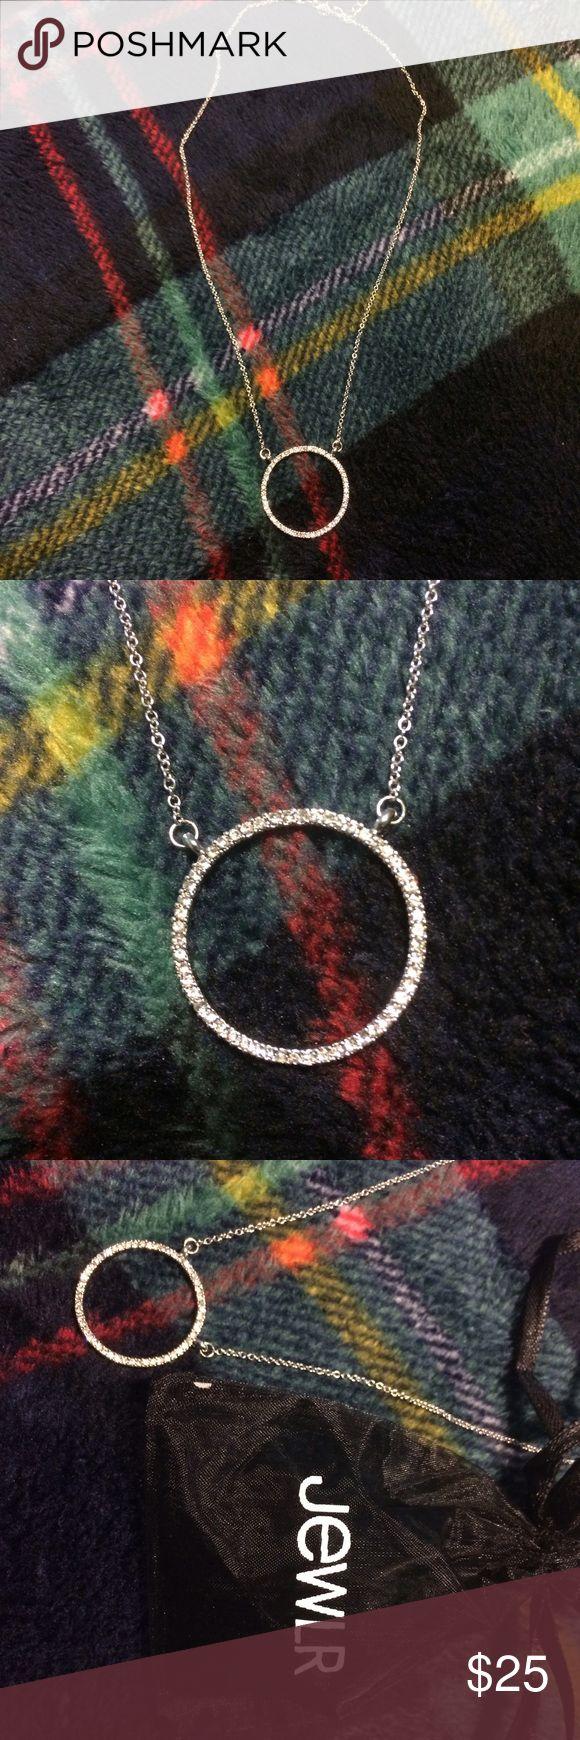 JEWLR swarovski crystal necklace. Brand new, never worn!! Includes original packaging. jewlr Jewelry Necklaces